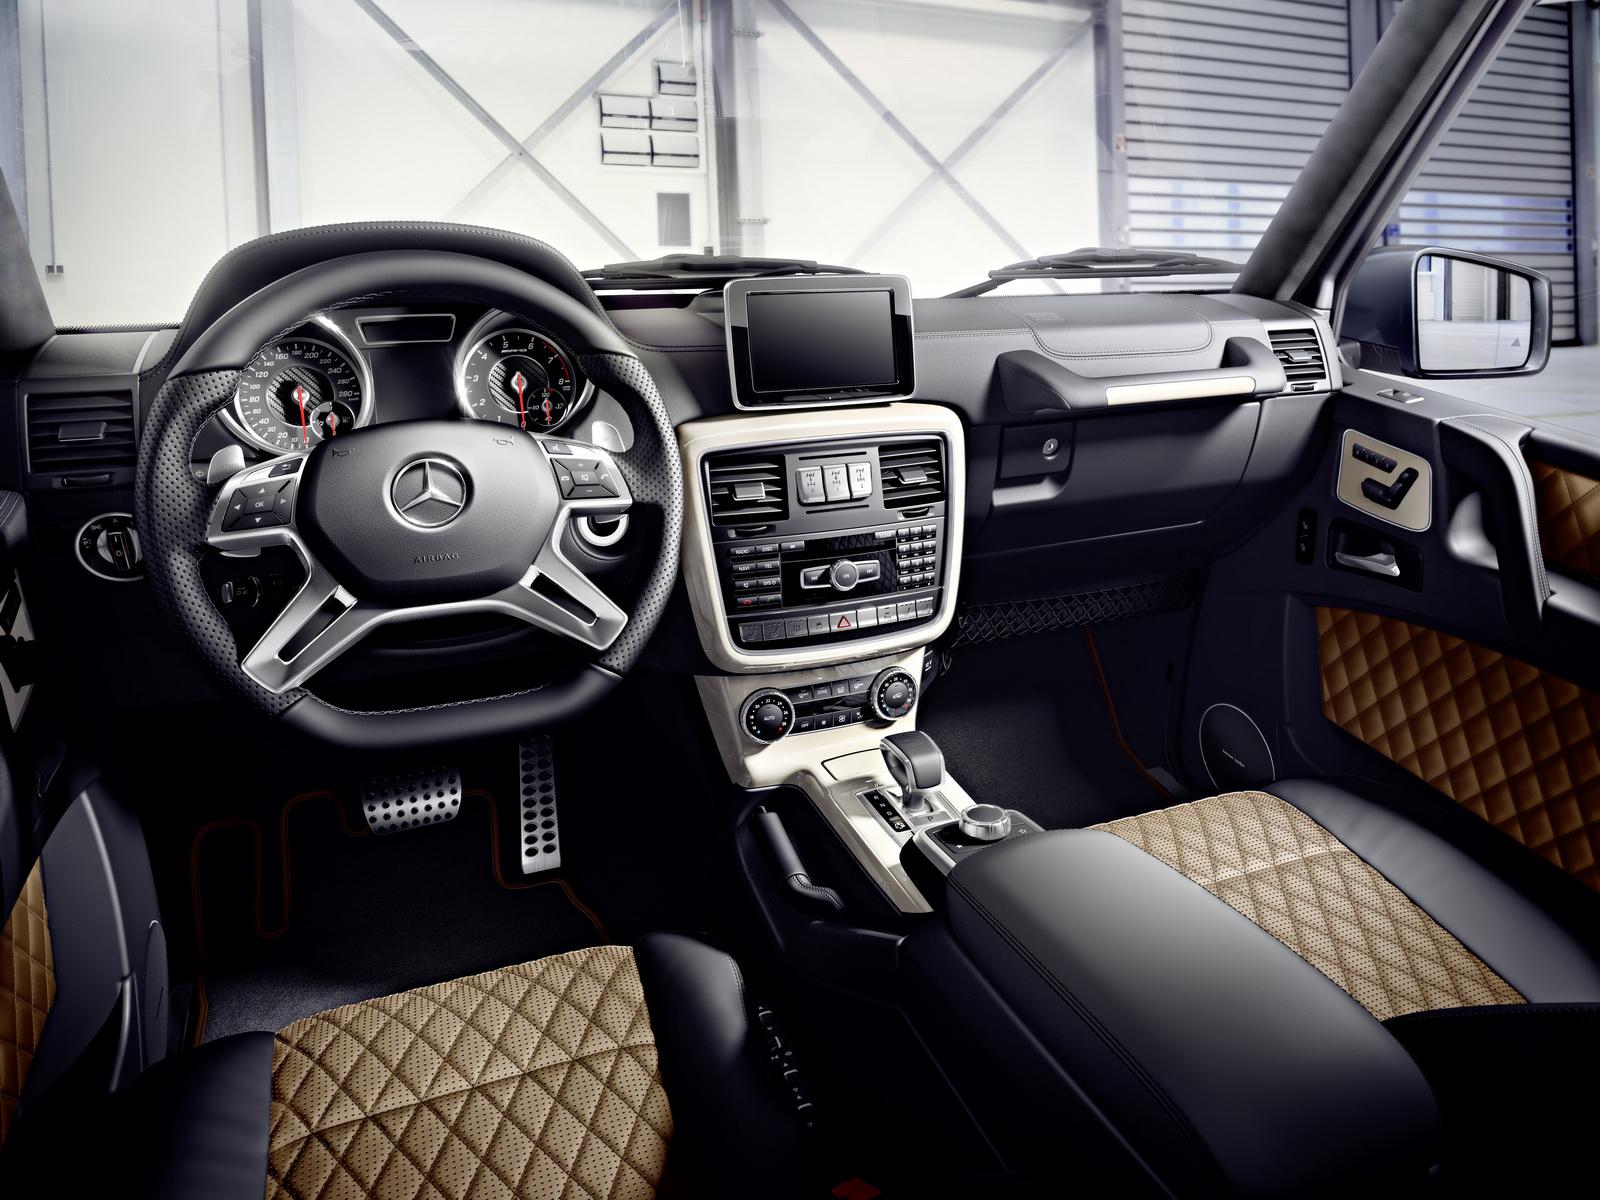 Mercedes-Benz G500 4x4²: Esta monstruosidad campera podrá ser tuya por 226.100 euros 2